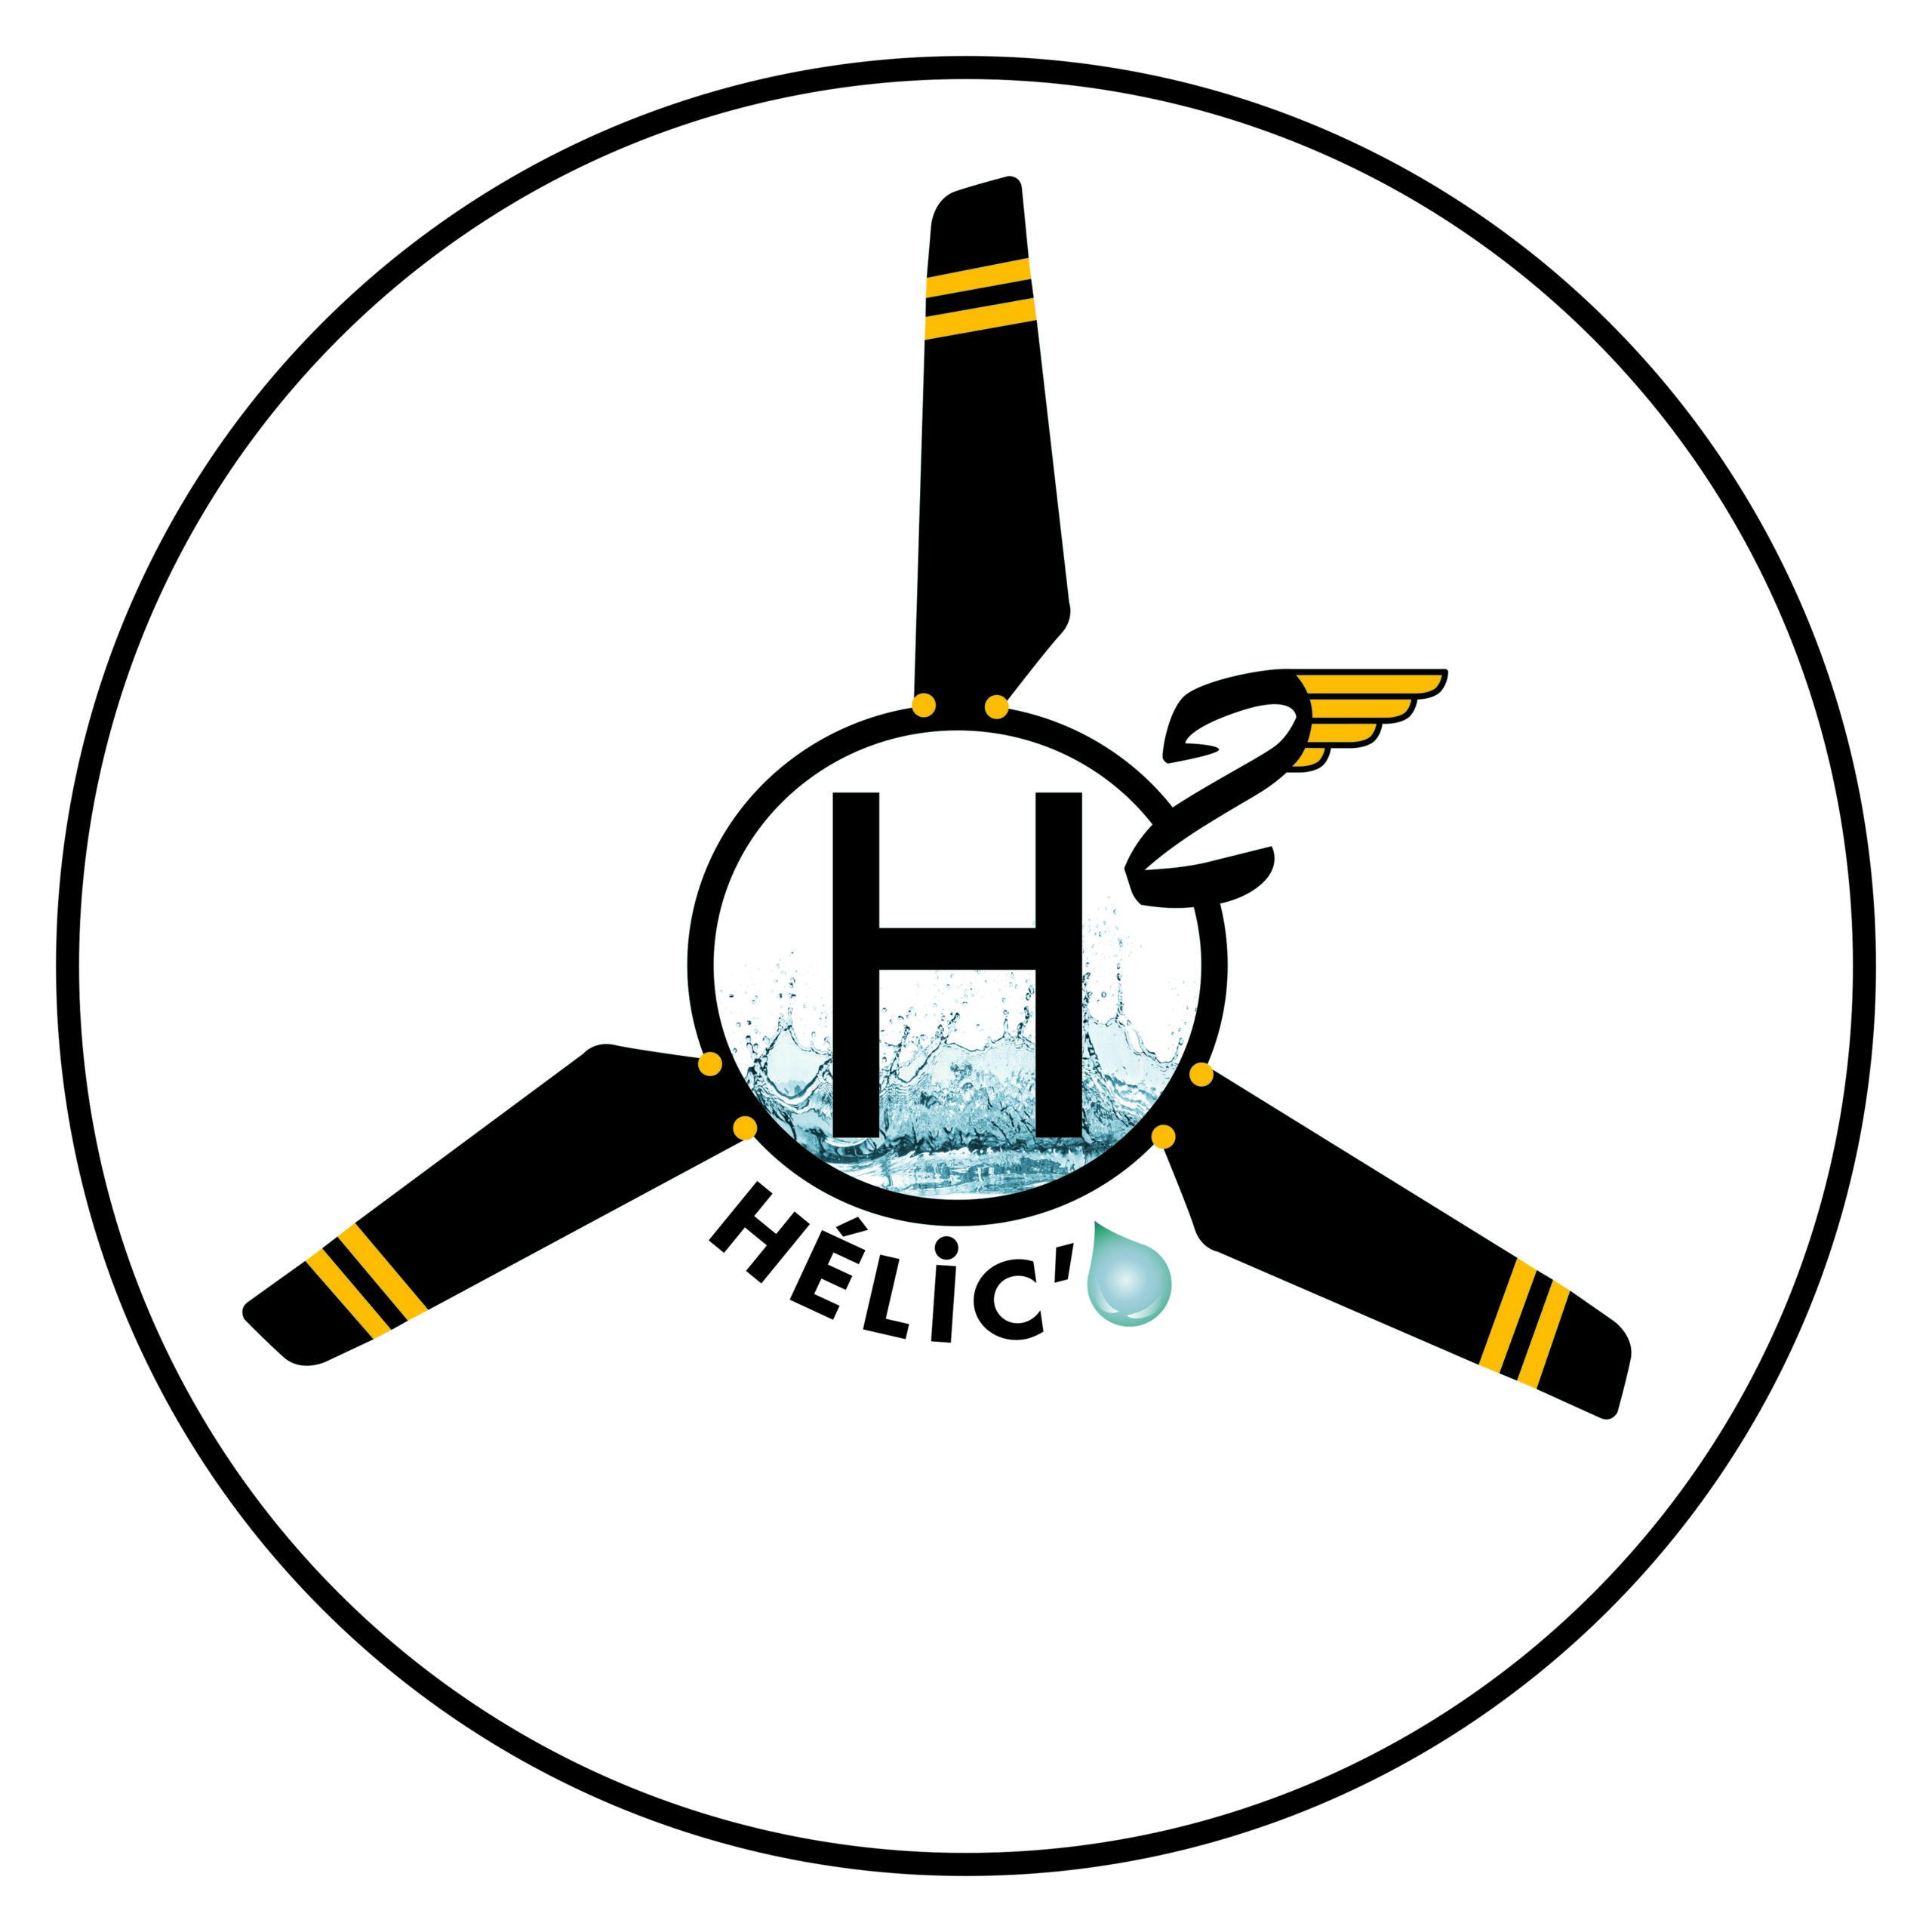 H2O HELIC'O